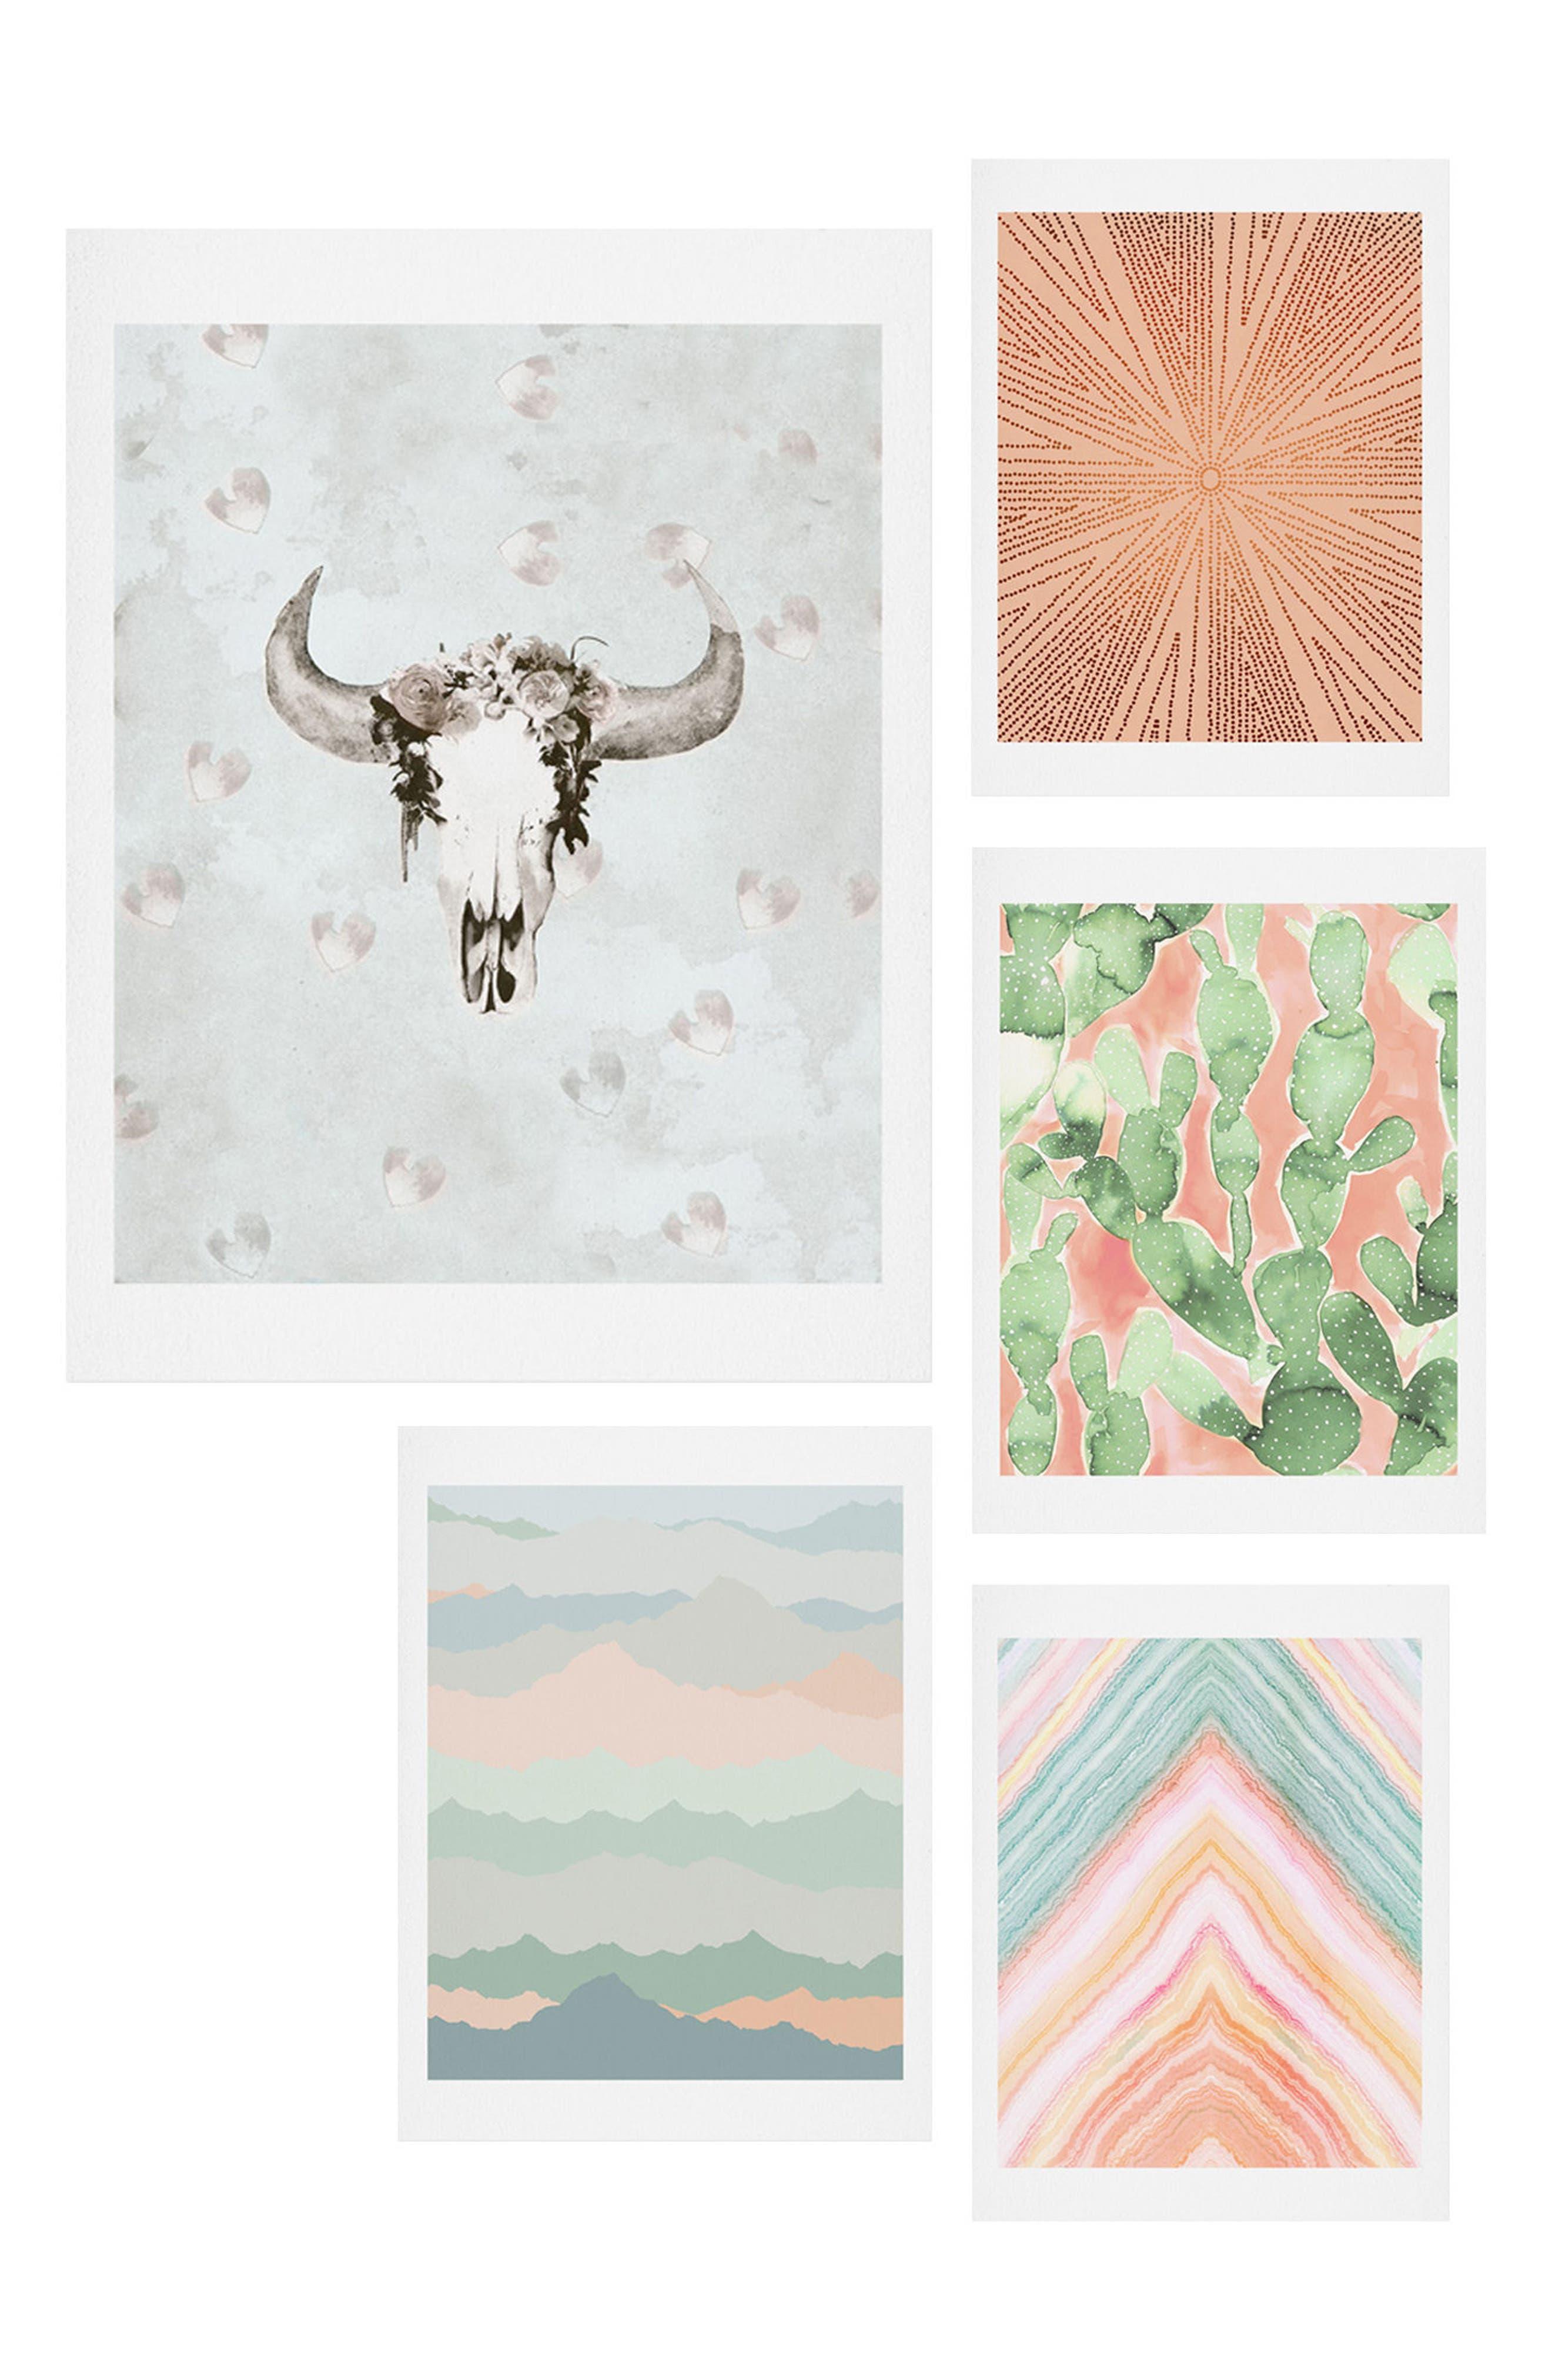 Desert Matcha Five-Piece Gallery Wall Art Print Set,                             Main thumbnail 1, color,                             BLUSH AND GREEN